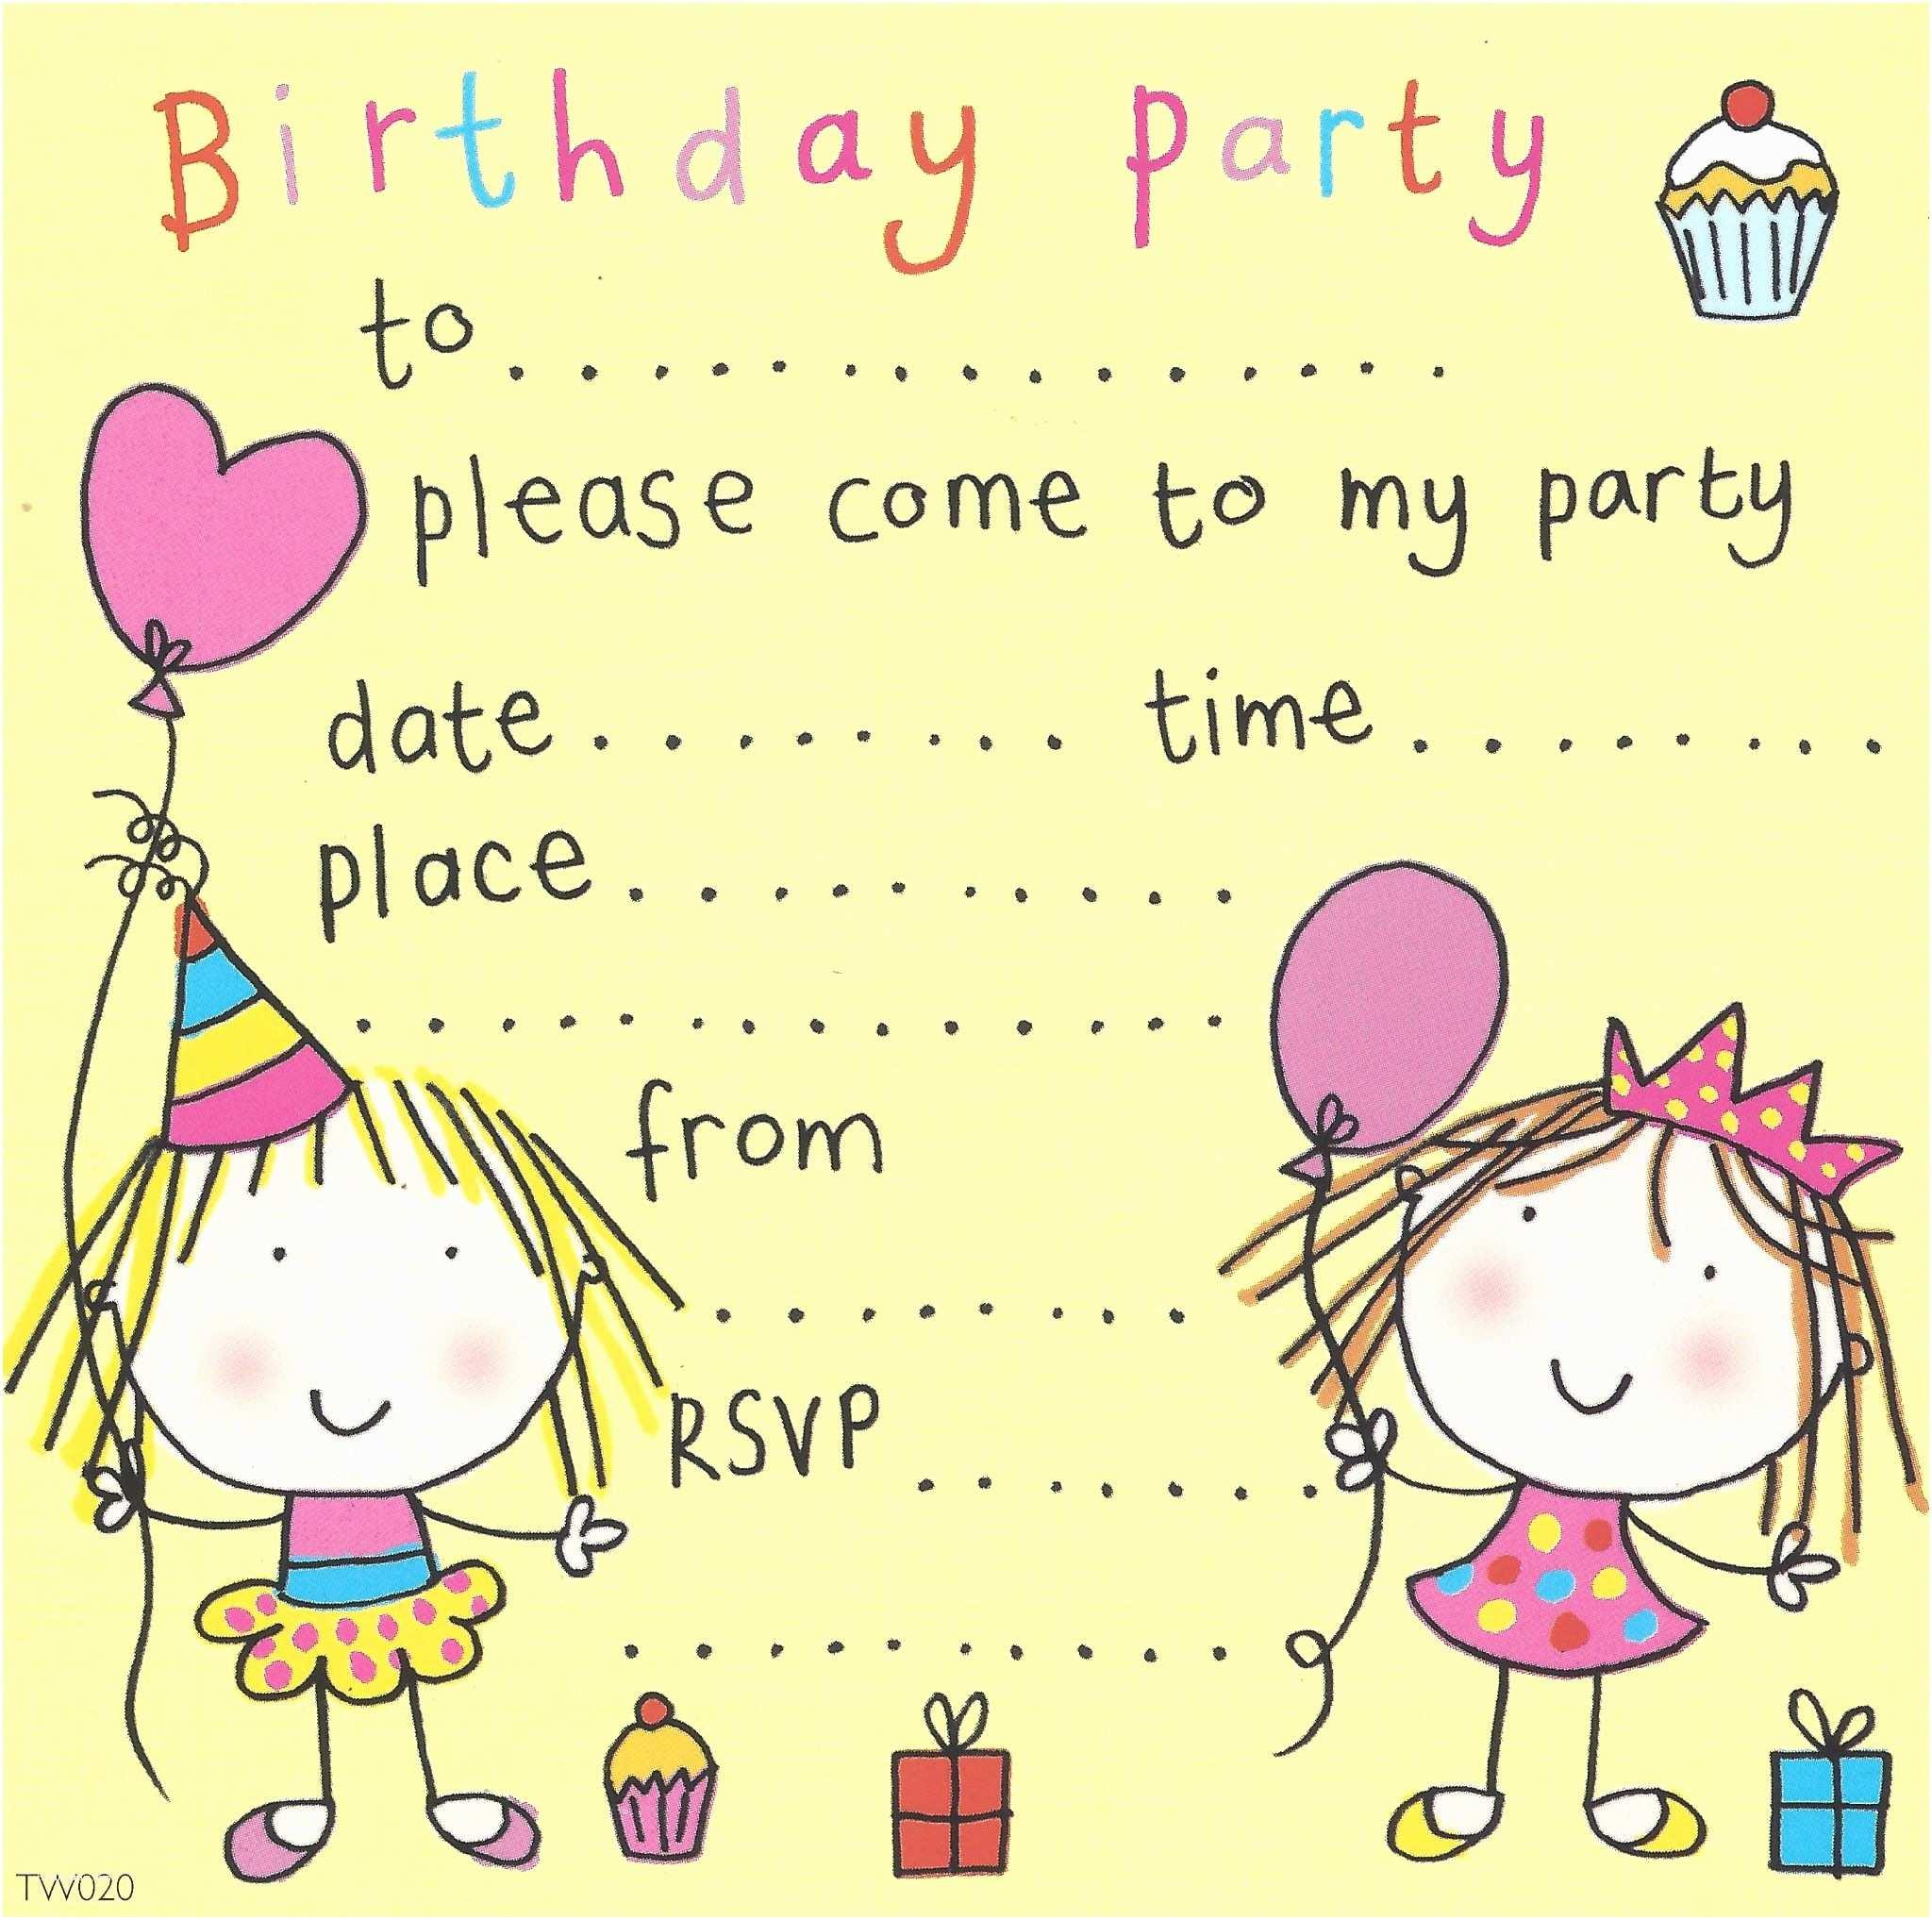 Girls Birthday Invitations Party Invitations Birthday Party Invitations Kids Party